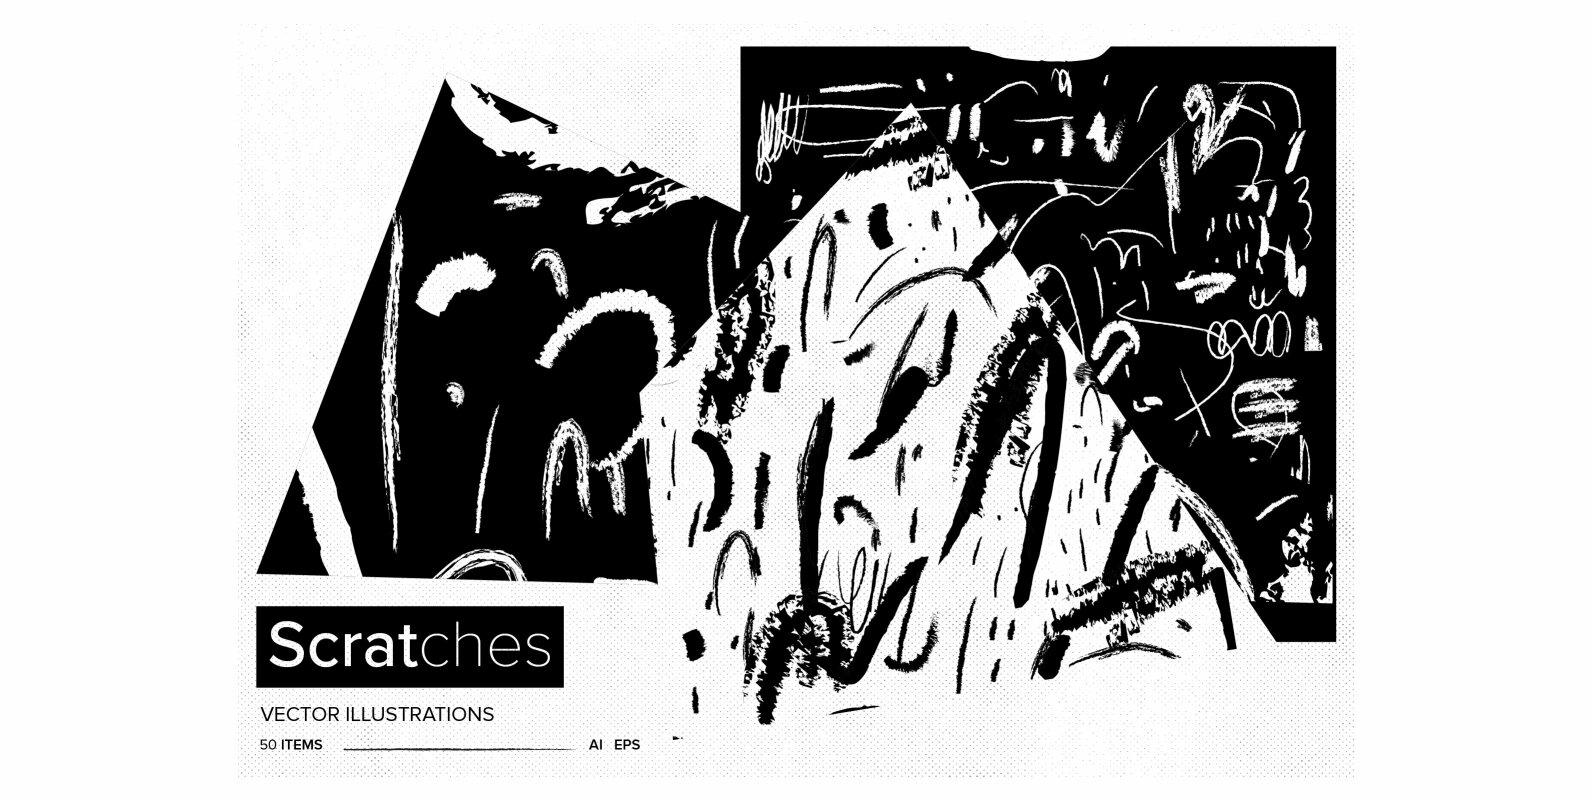 Scratches